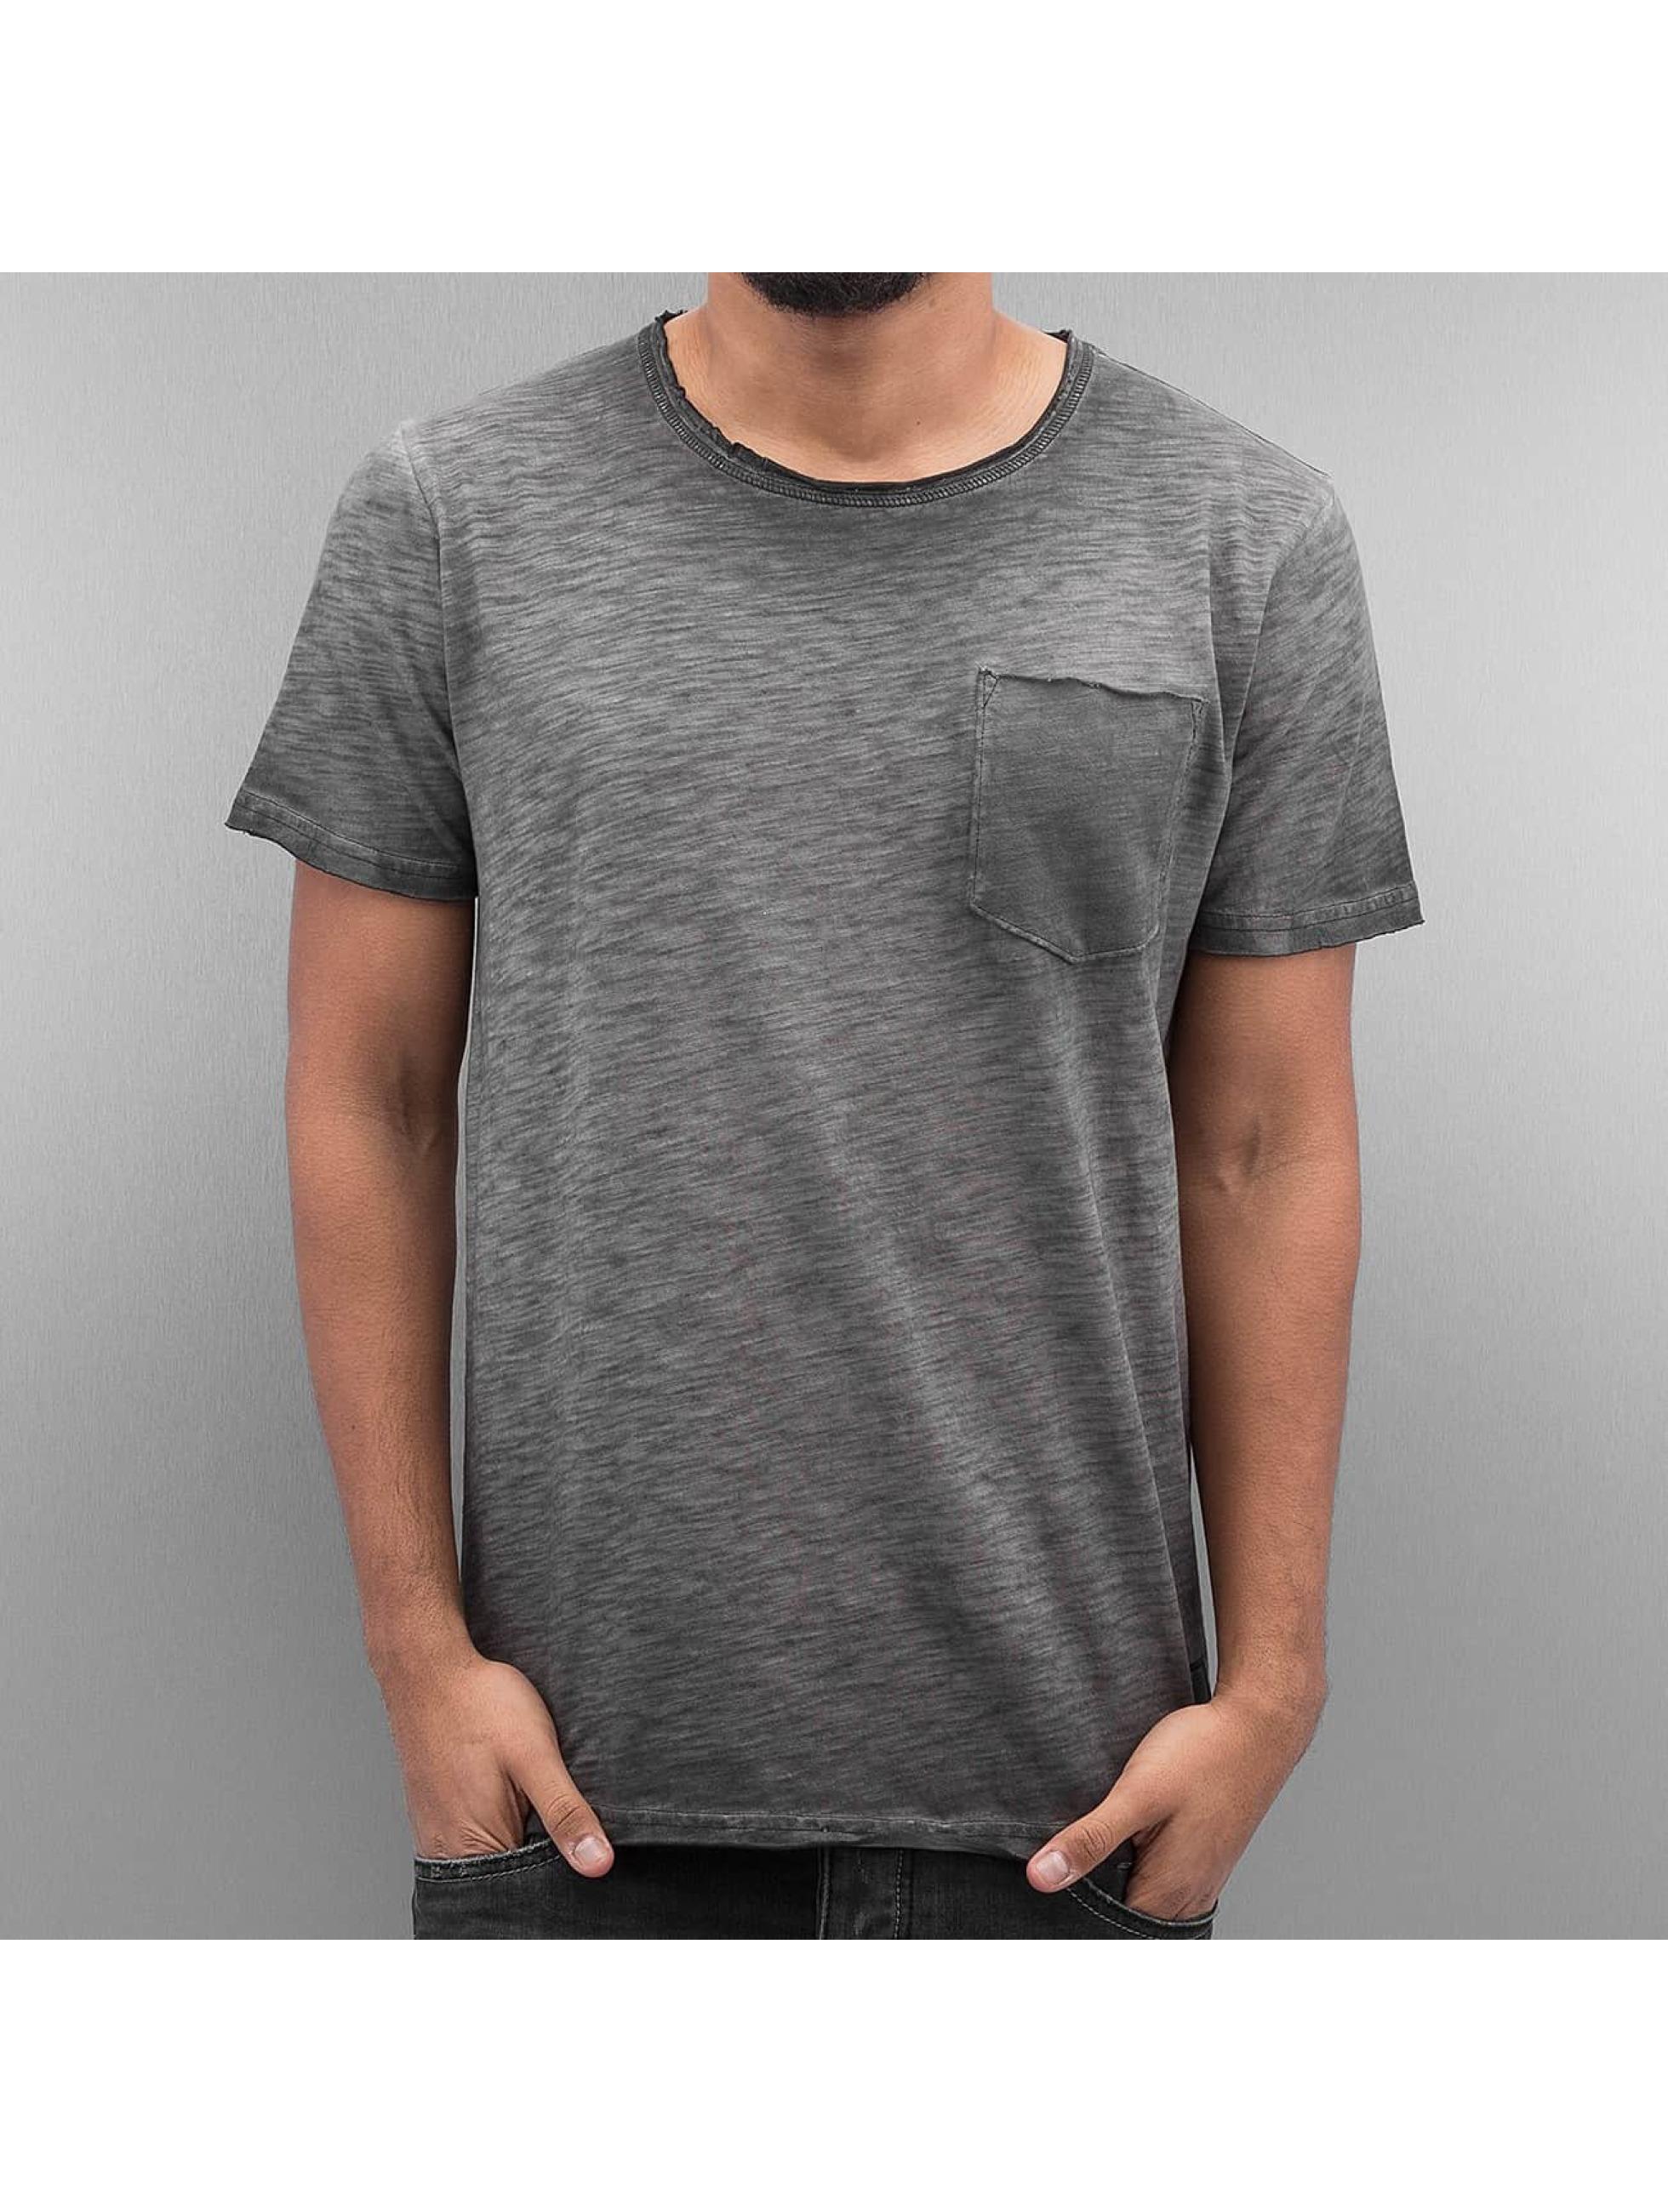 SHINE Original T-Shirt Dye grey